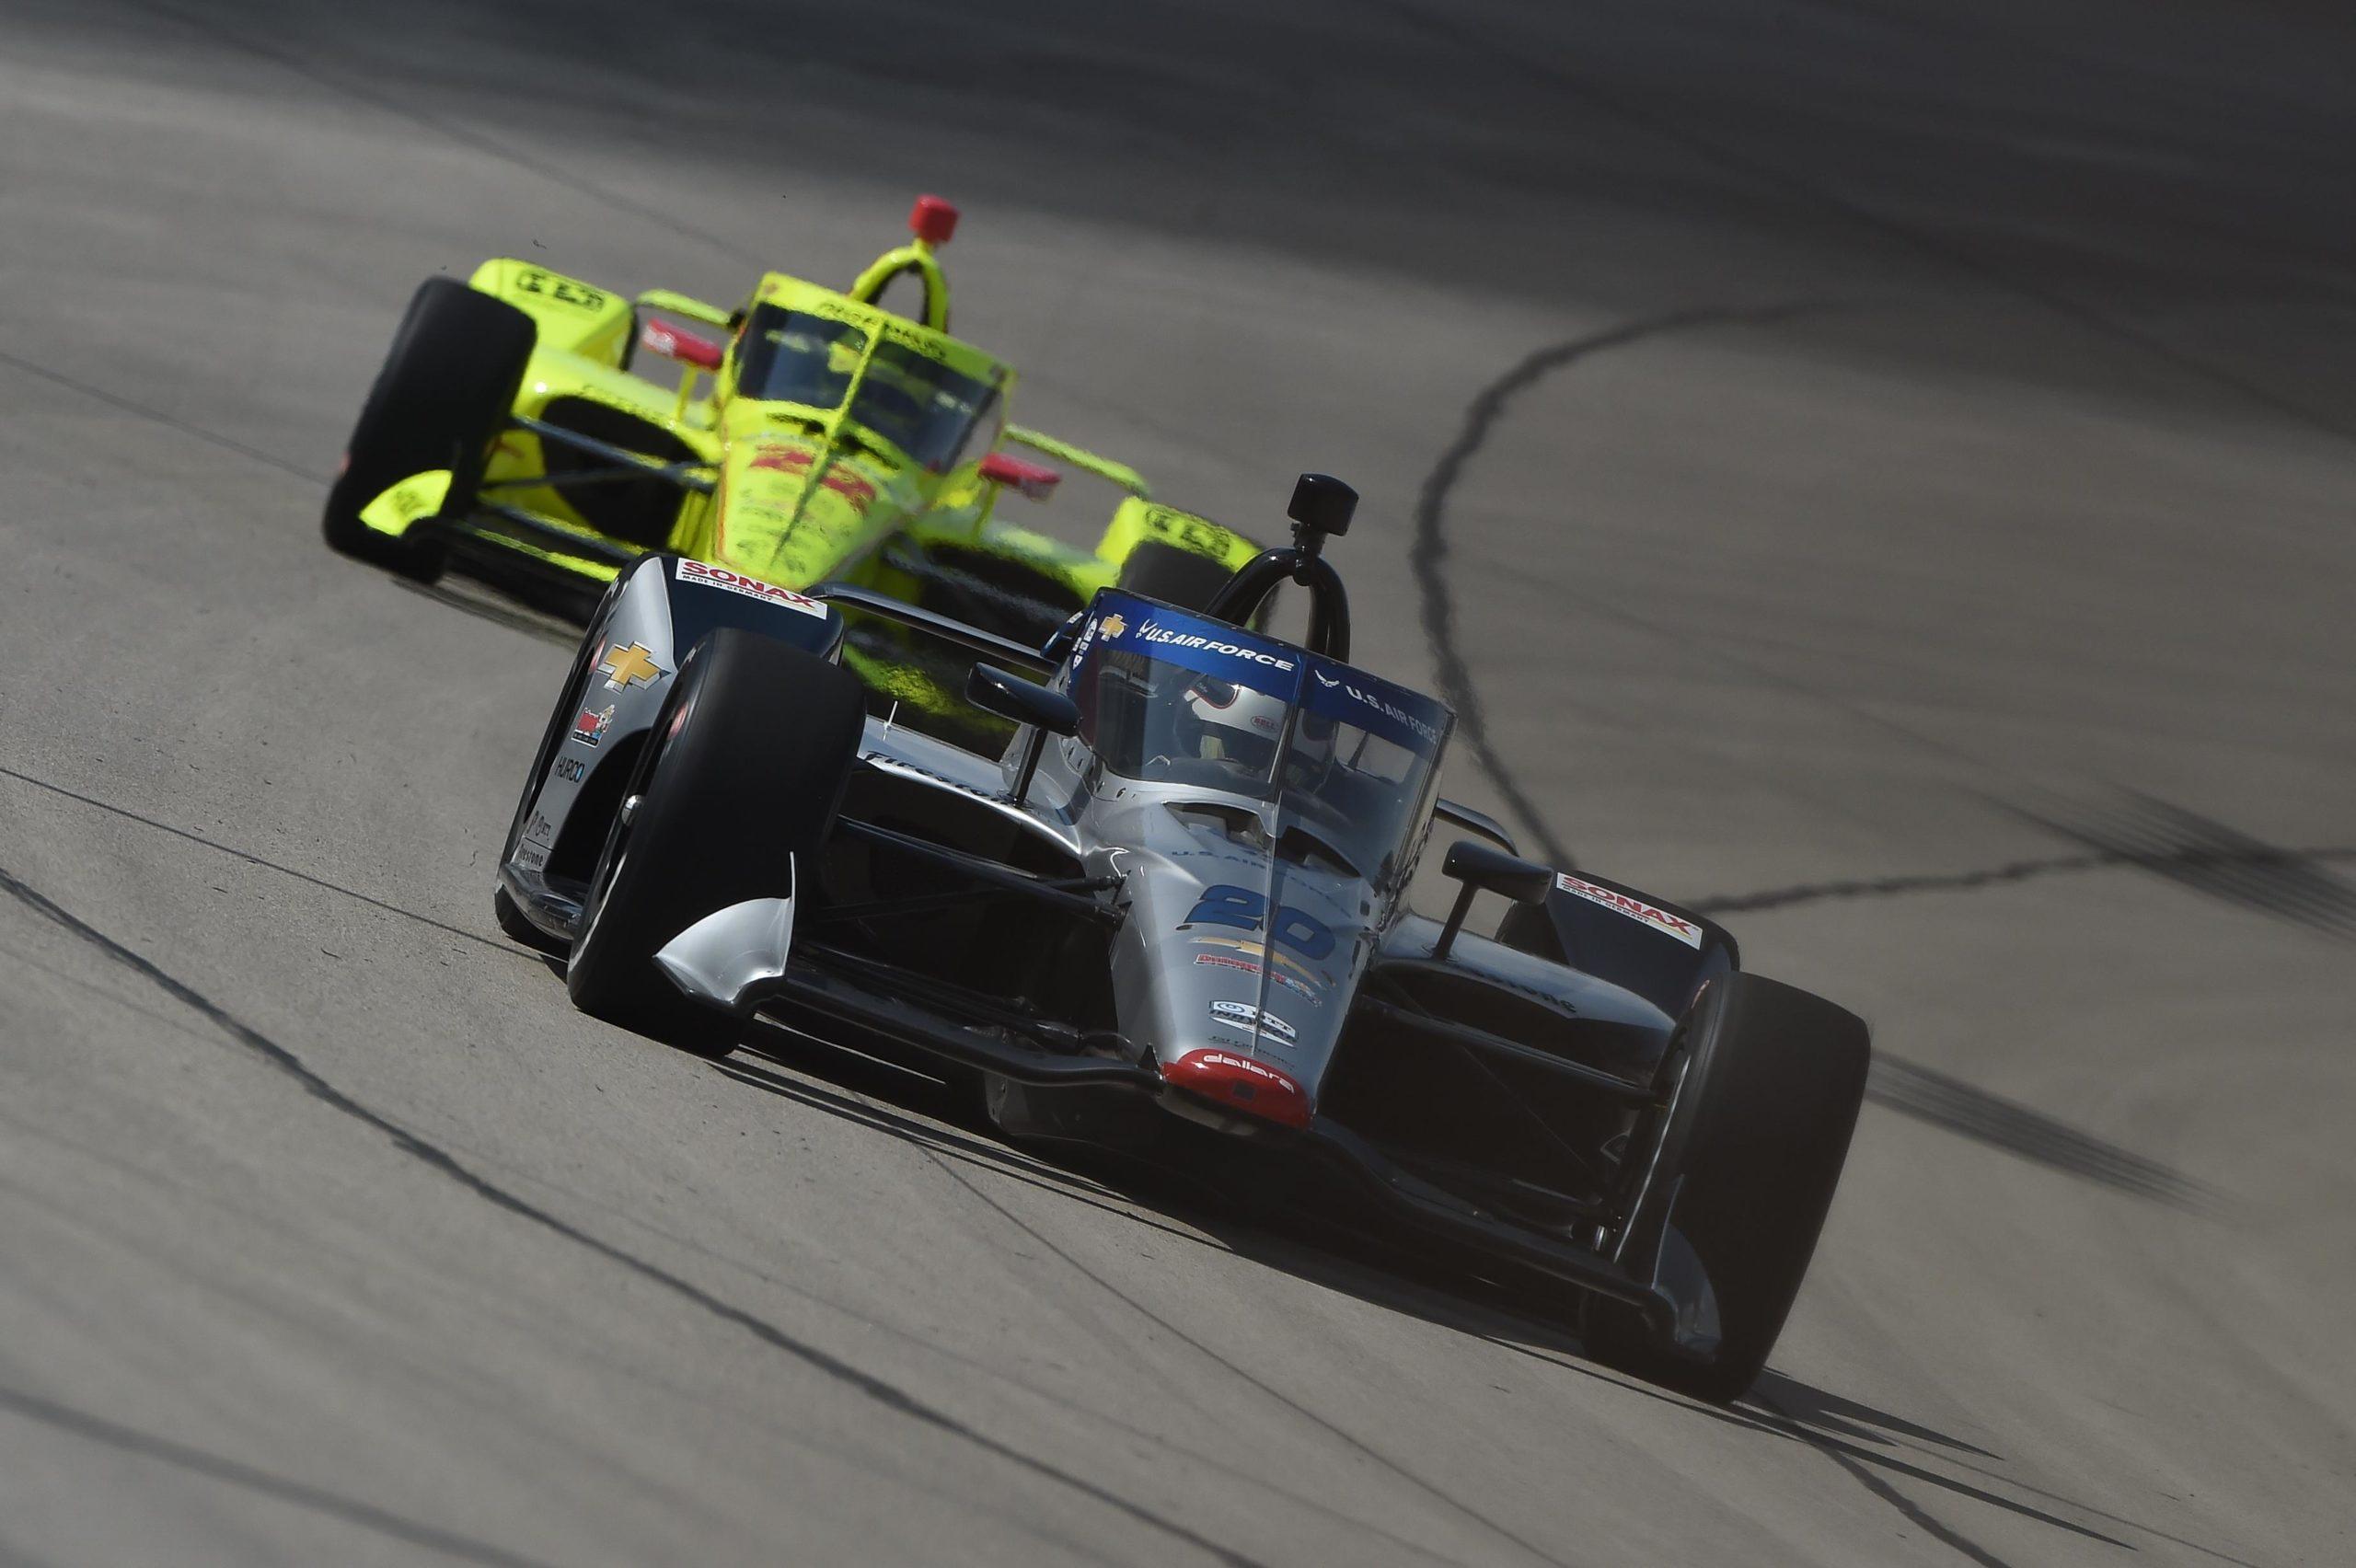 2021 NTT IndyCar Series Season Preview, Pt. 2